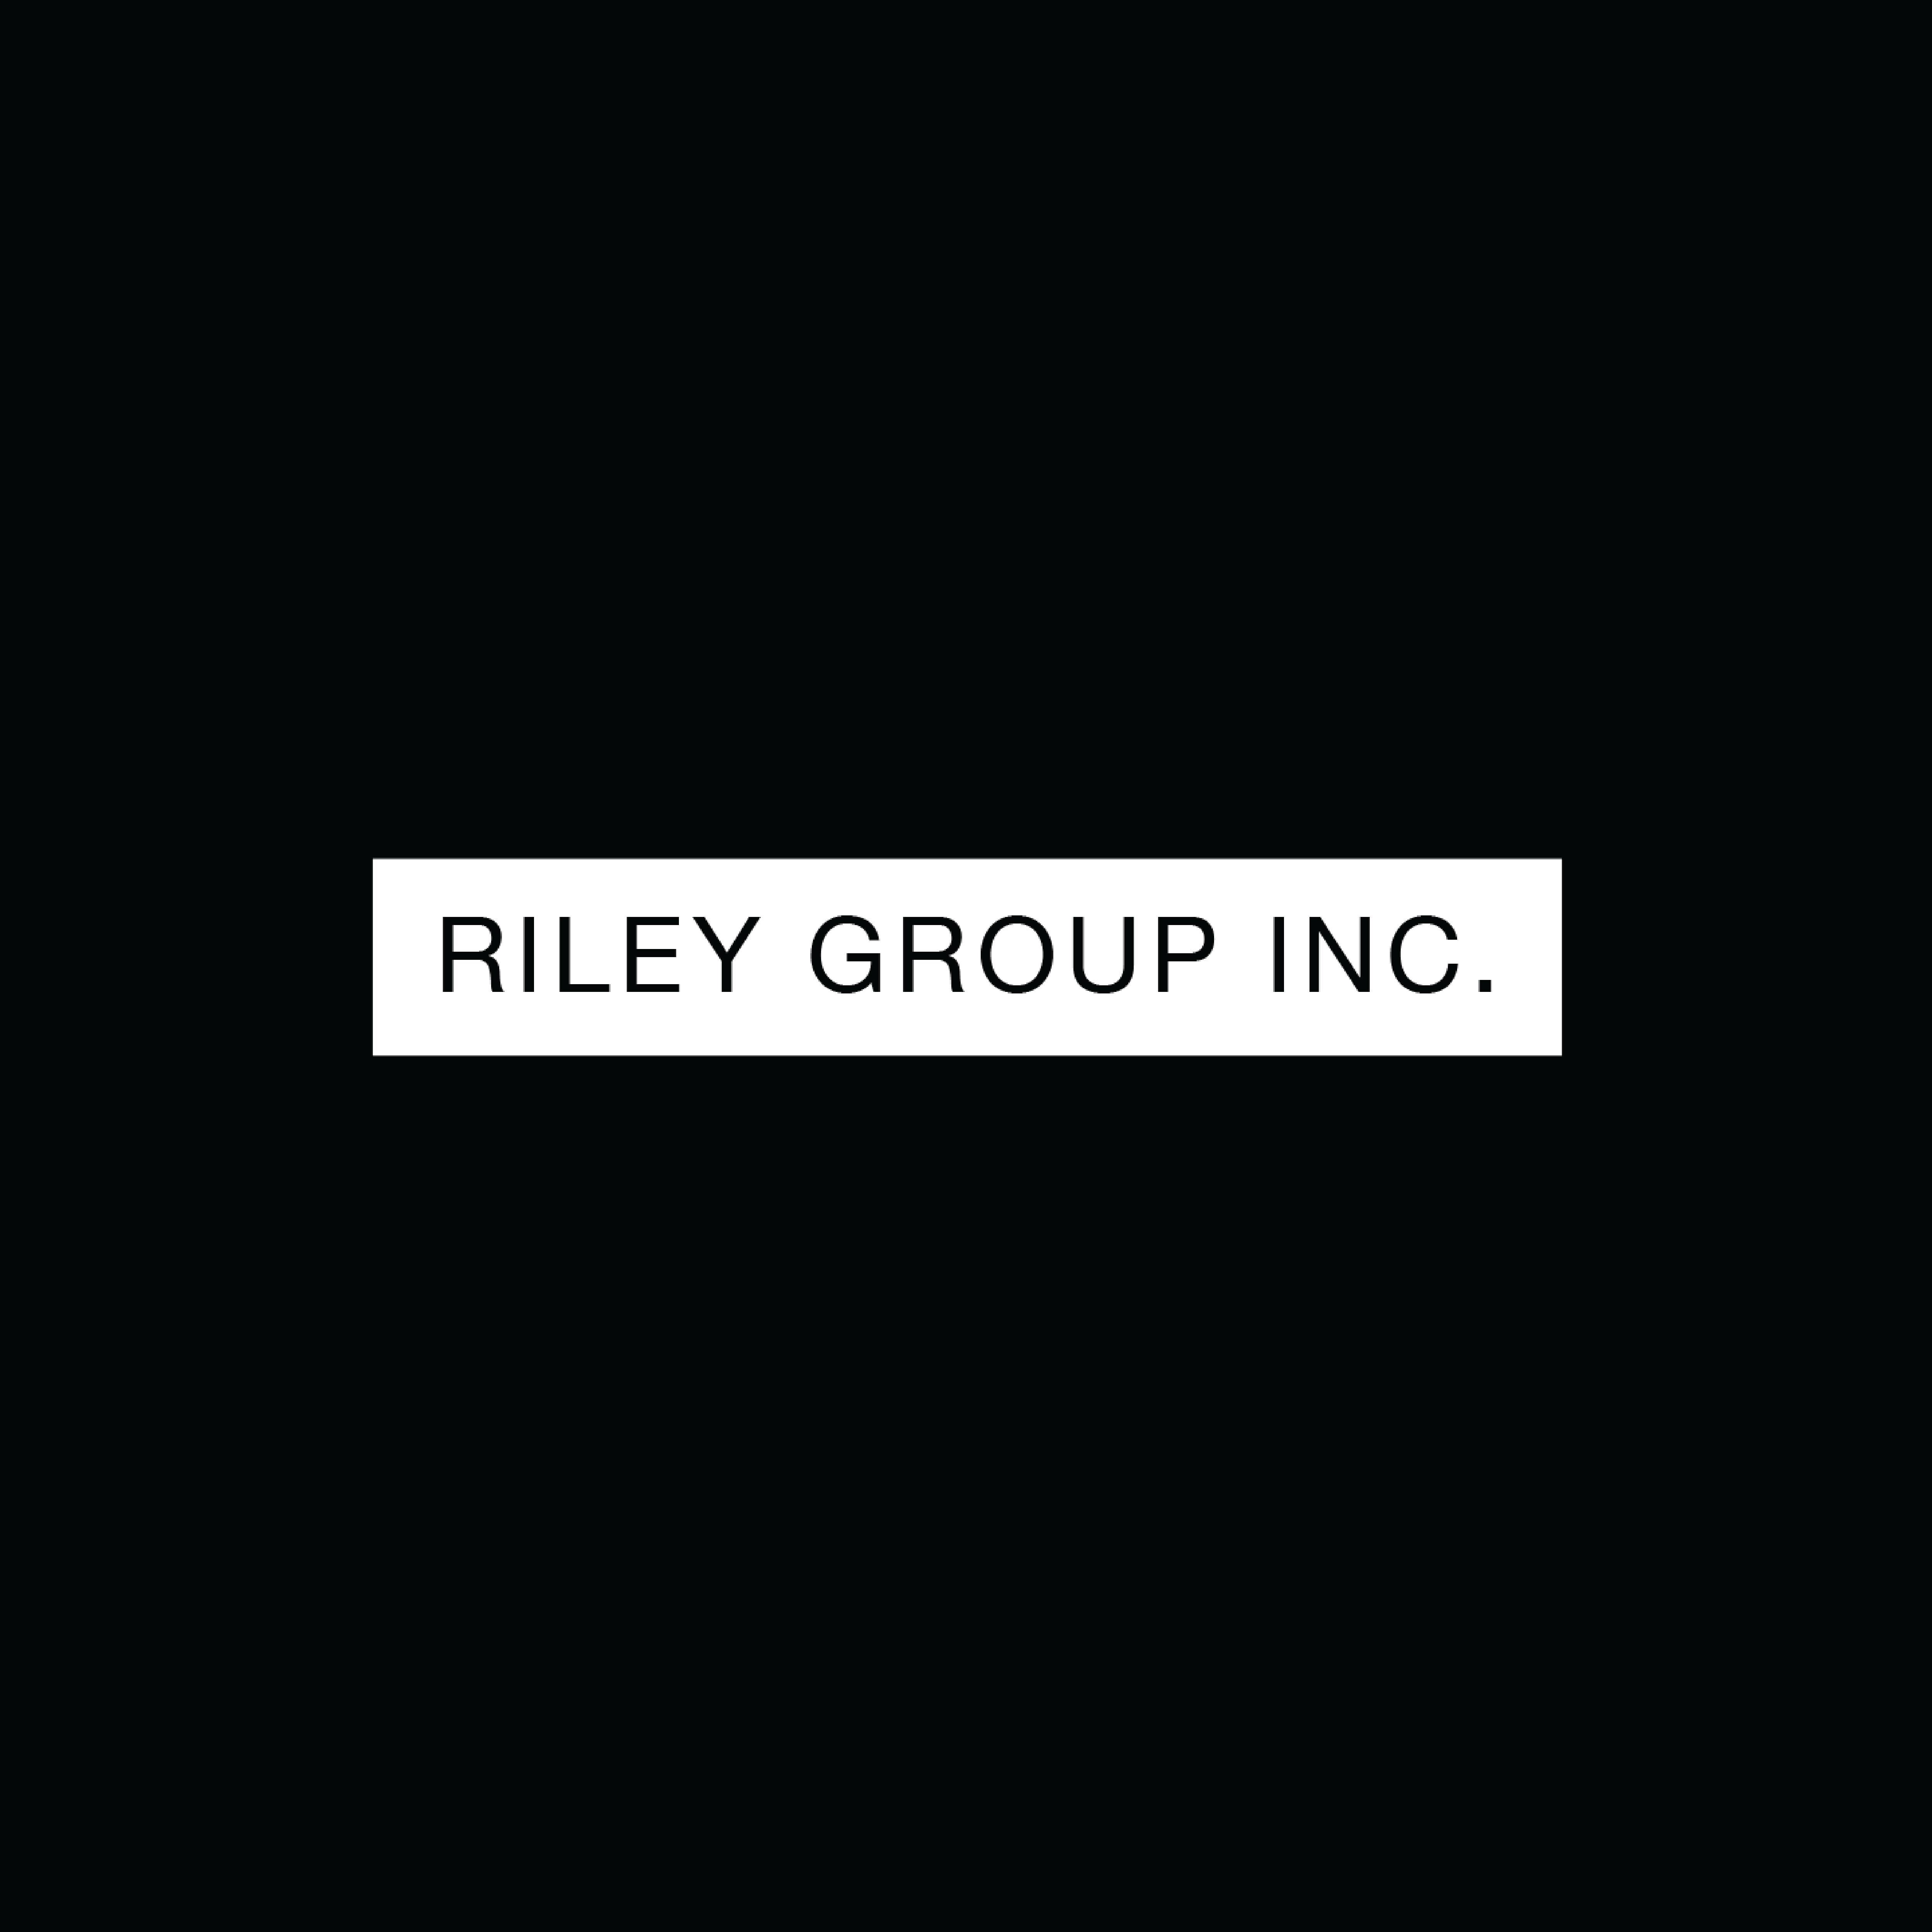 Riley group inc.